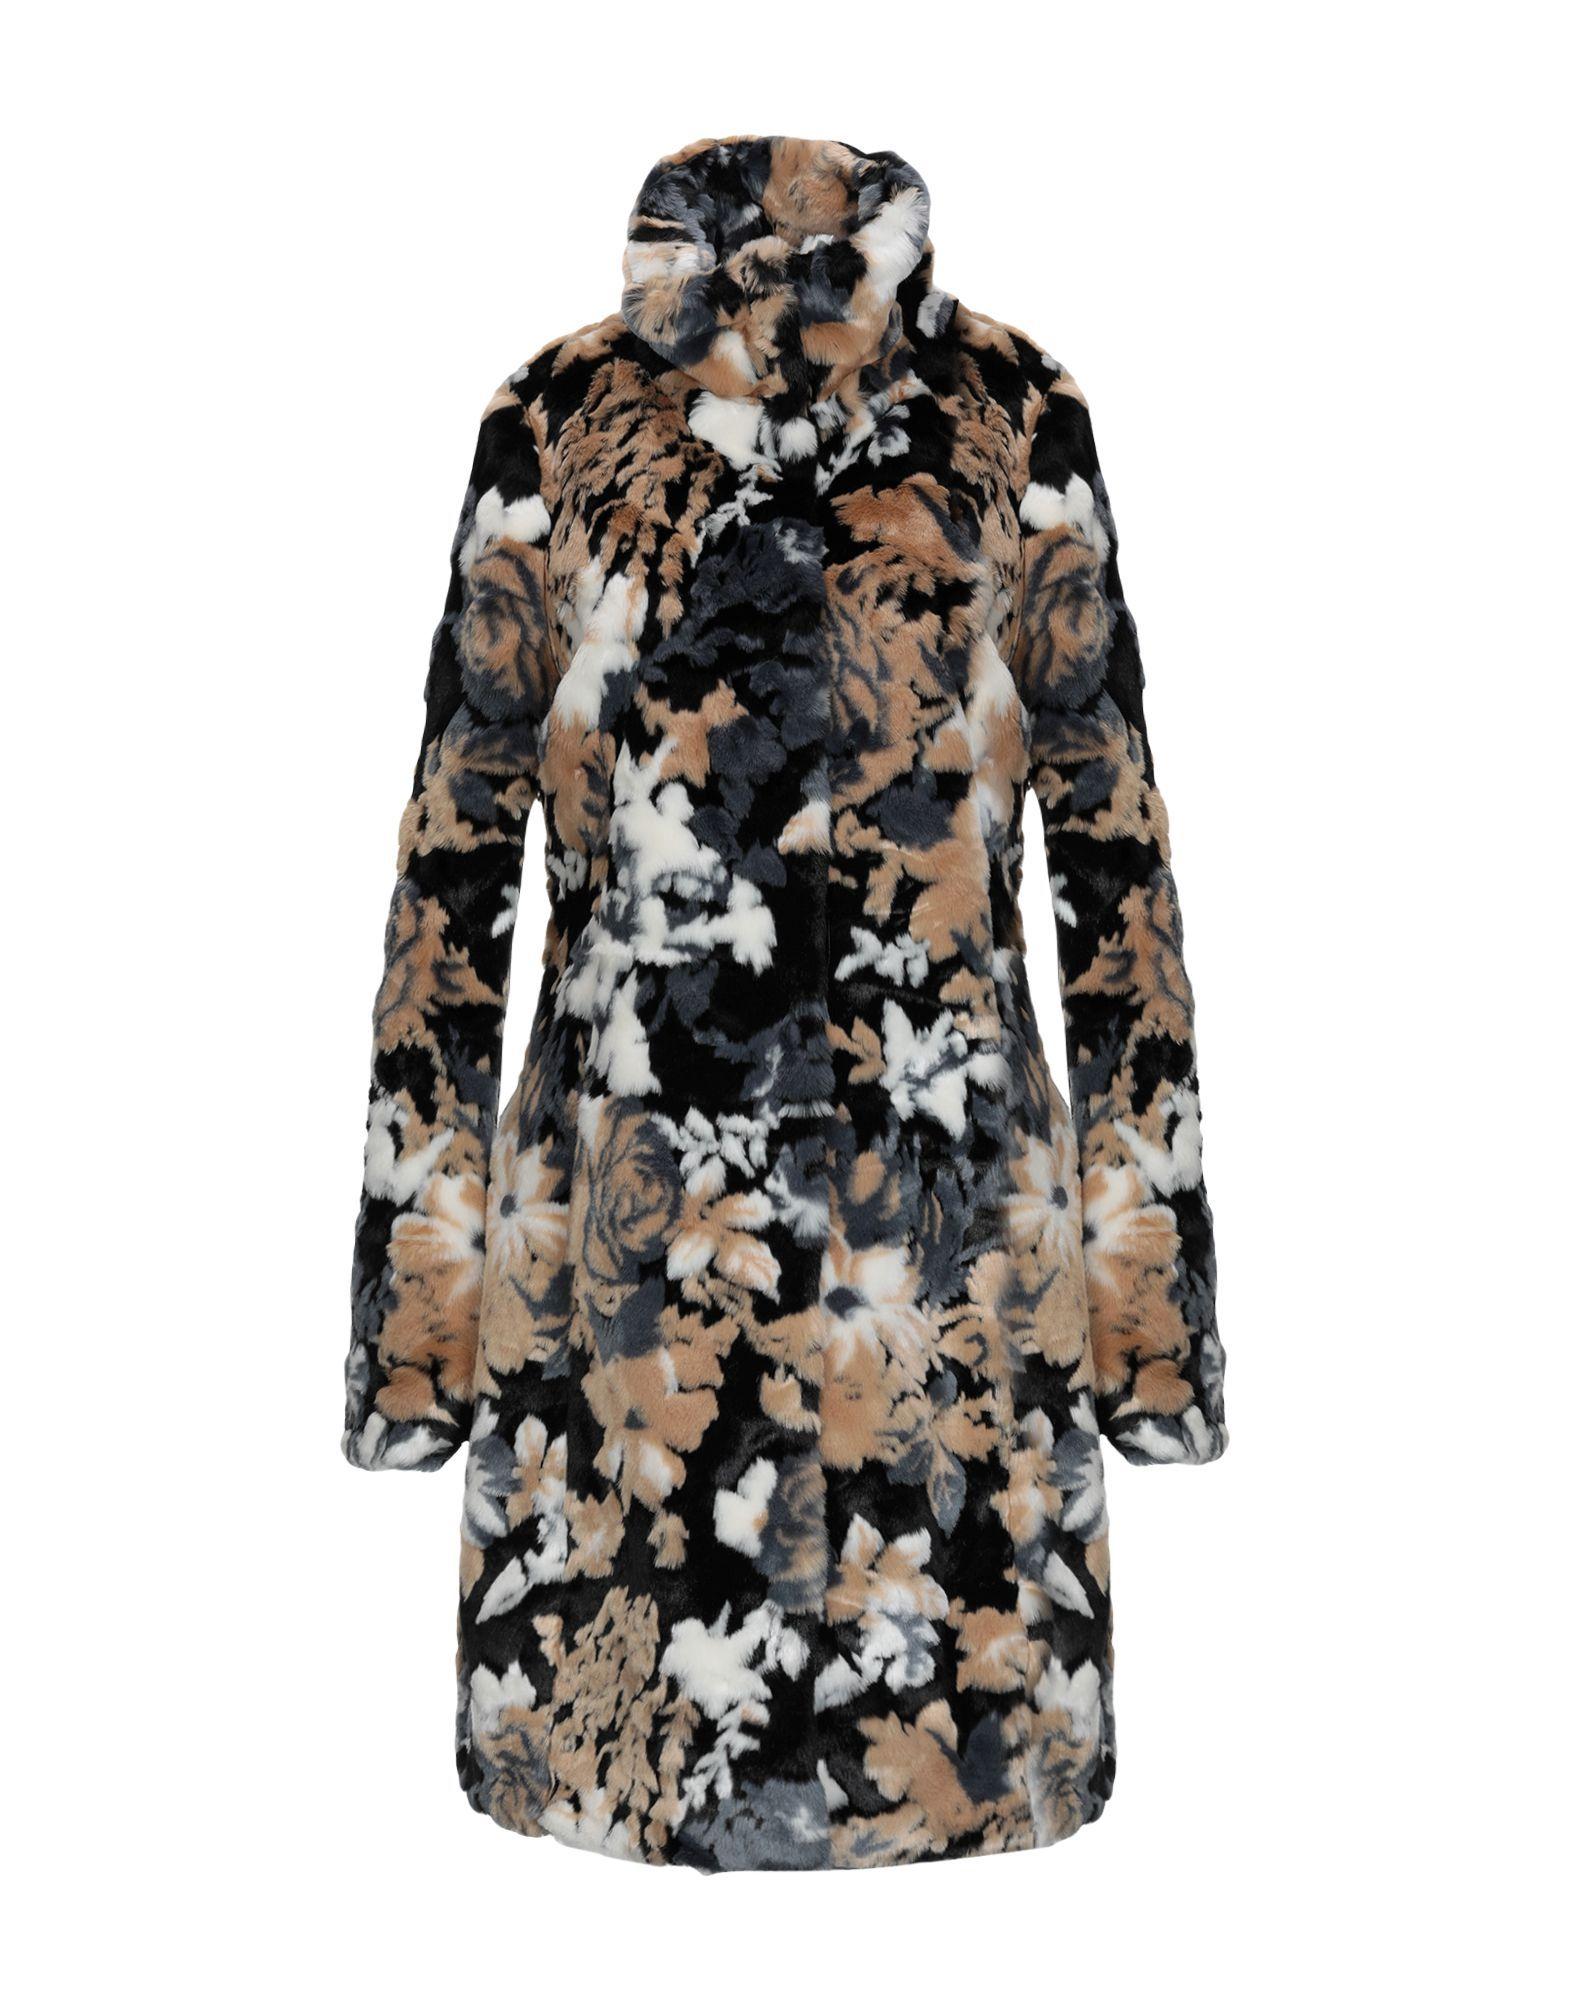 Patrizia Pepe Camel Print Faux Fur Coat